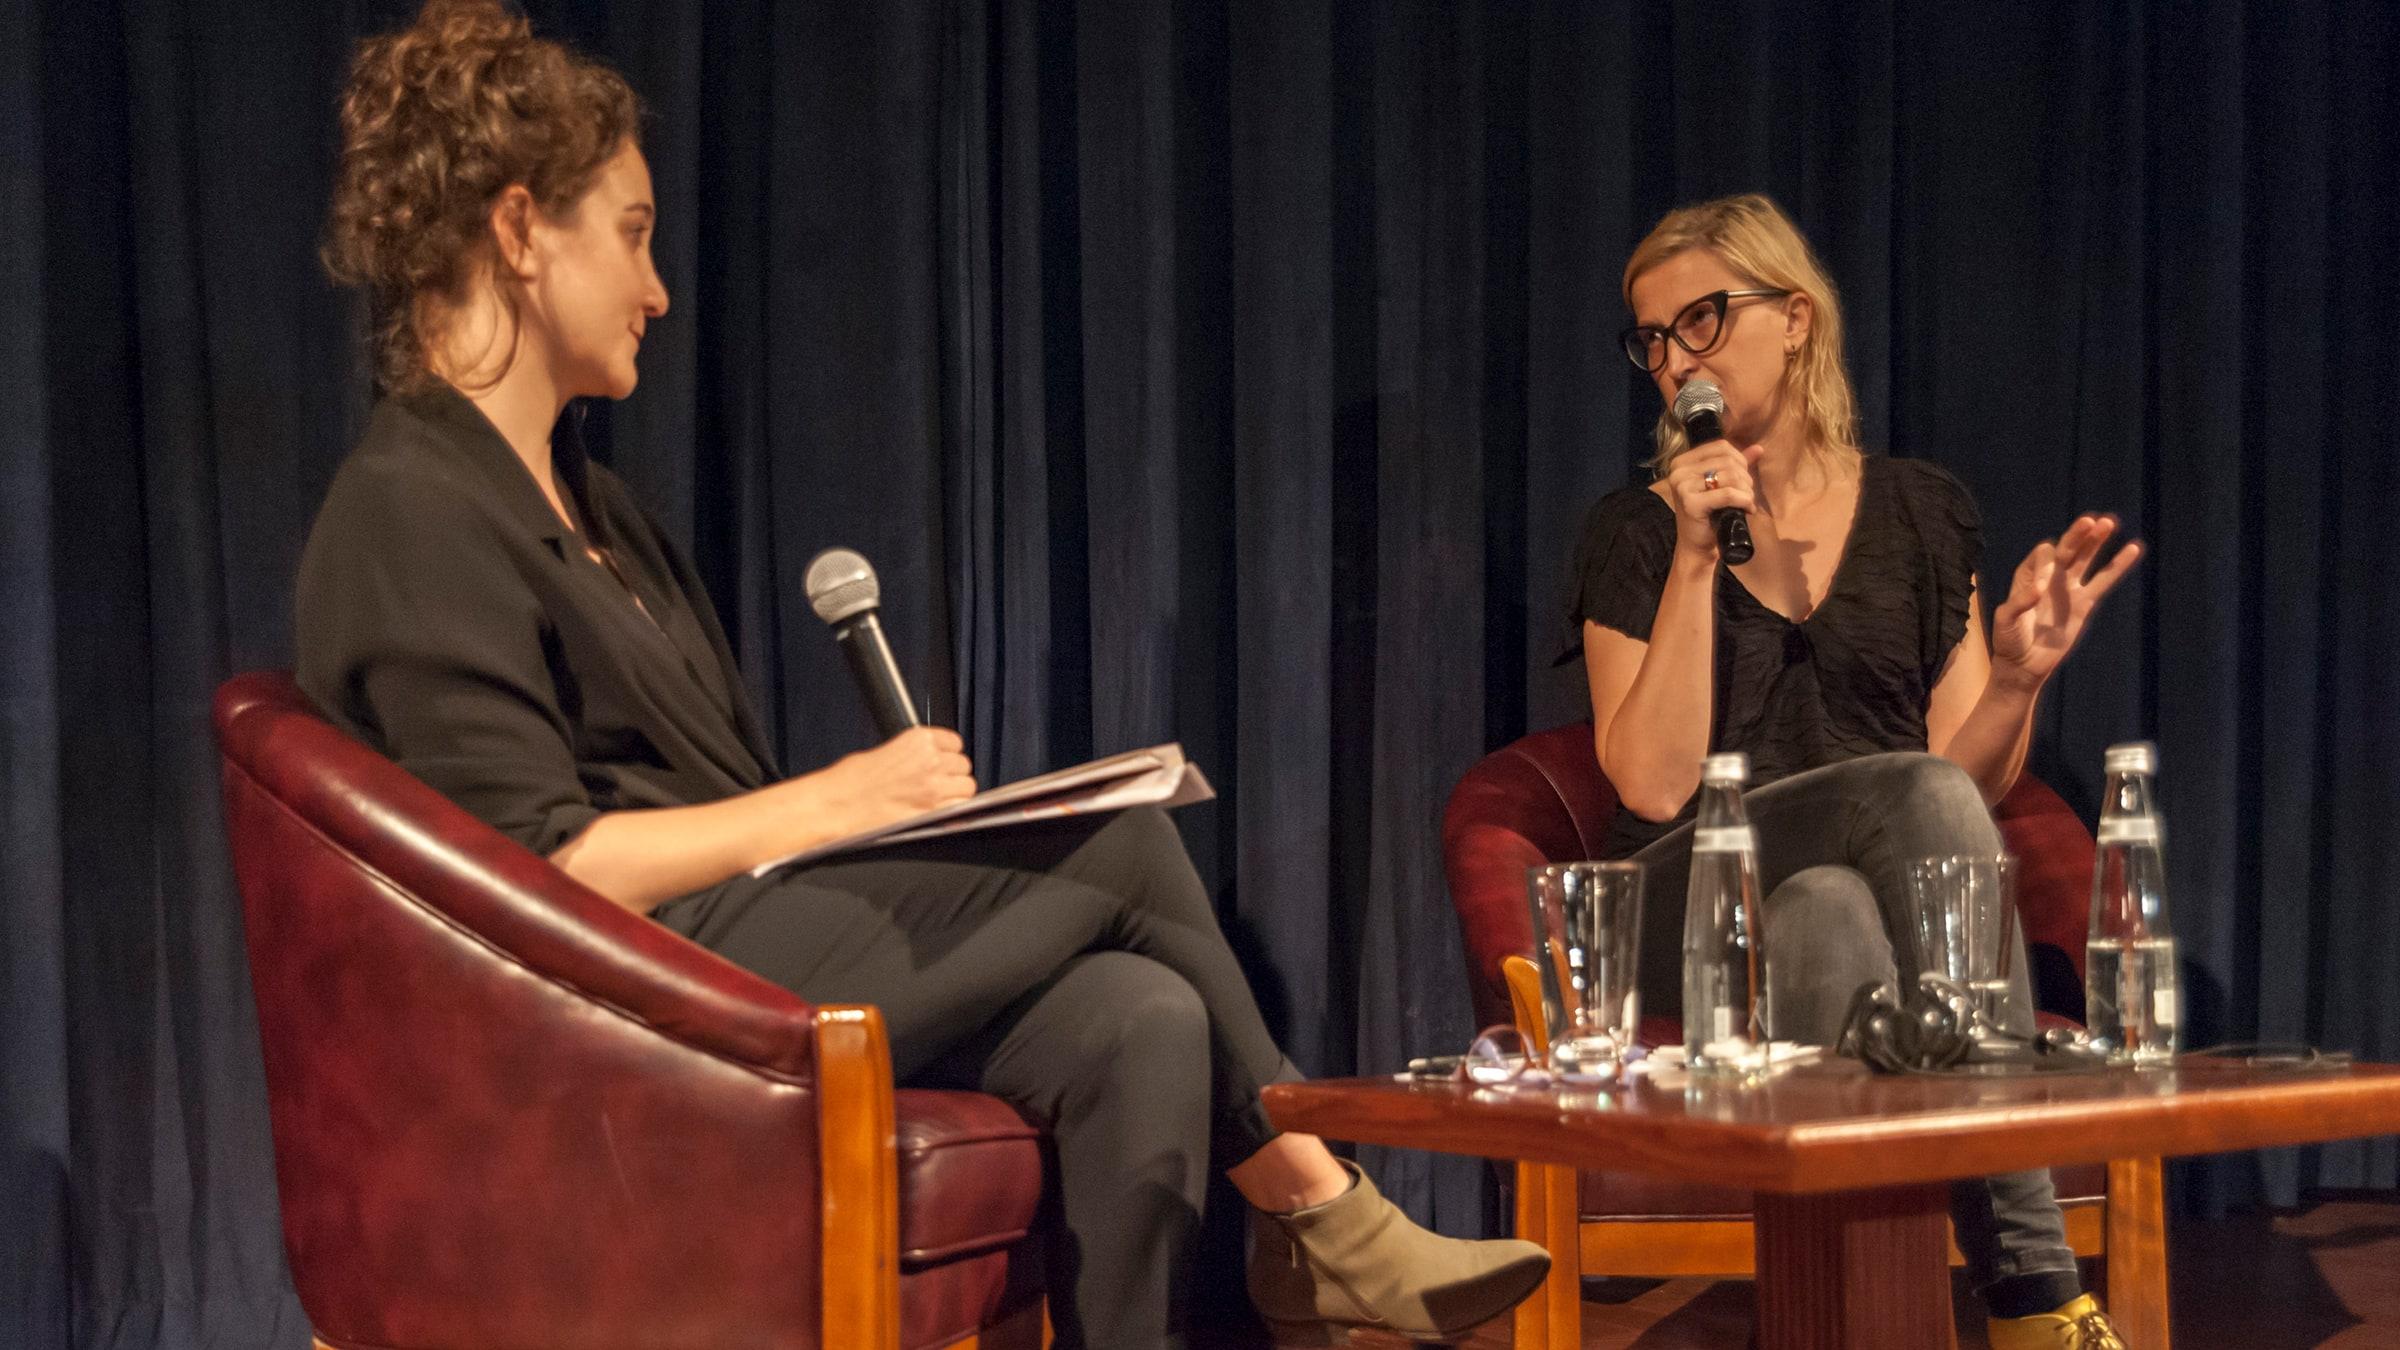 Director Jasmila Žbanić in Conversation